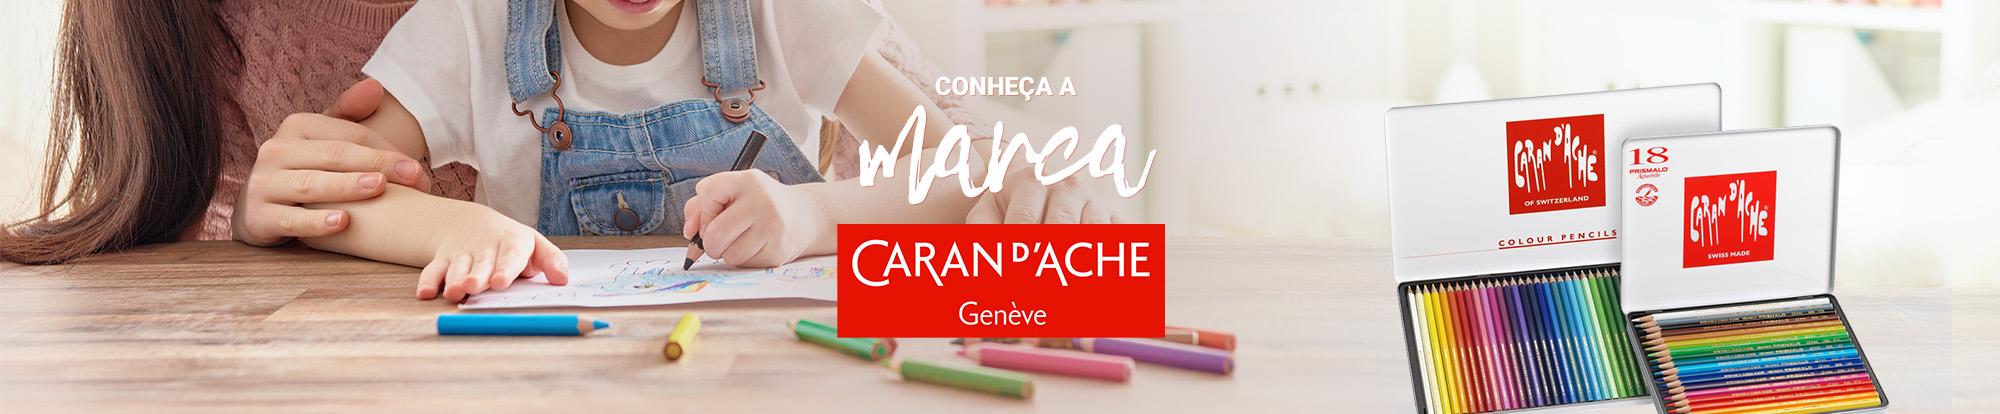 Banner Marca Caran D